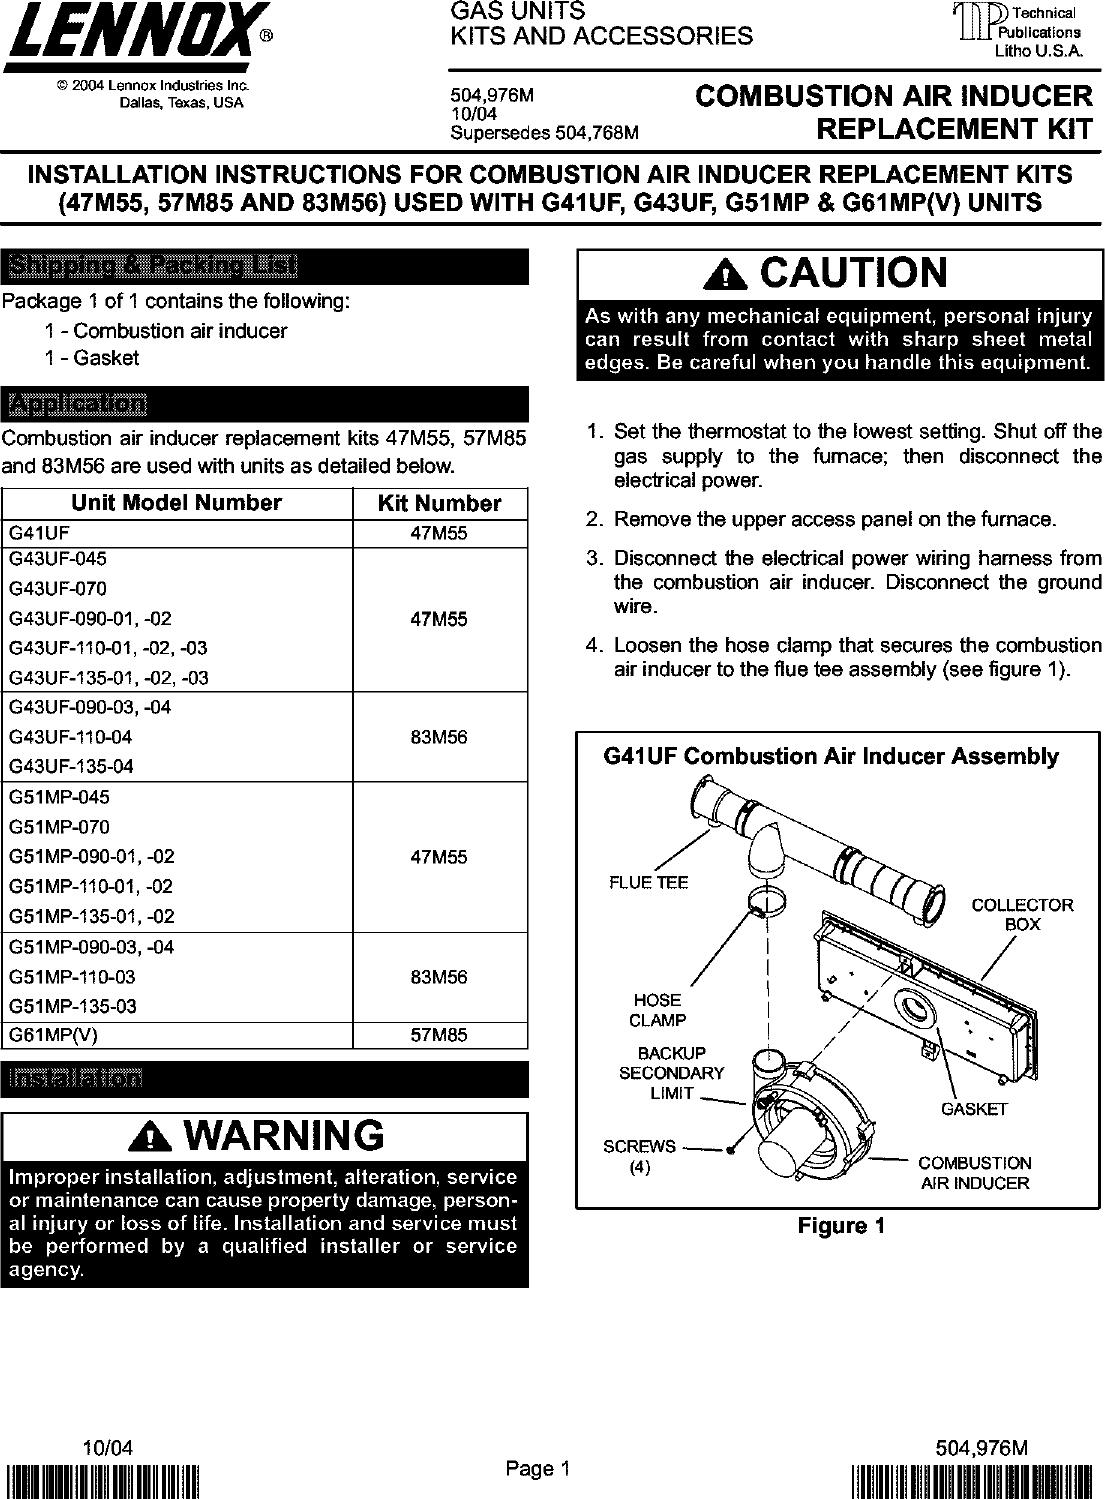 lennox pulse furnace manual pdf